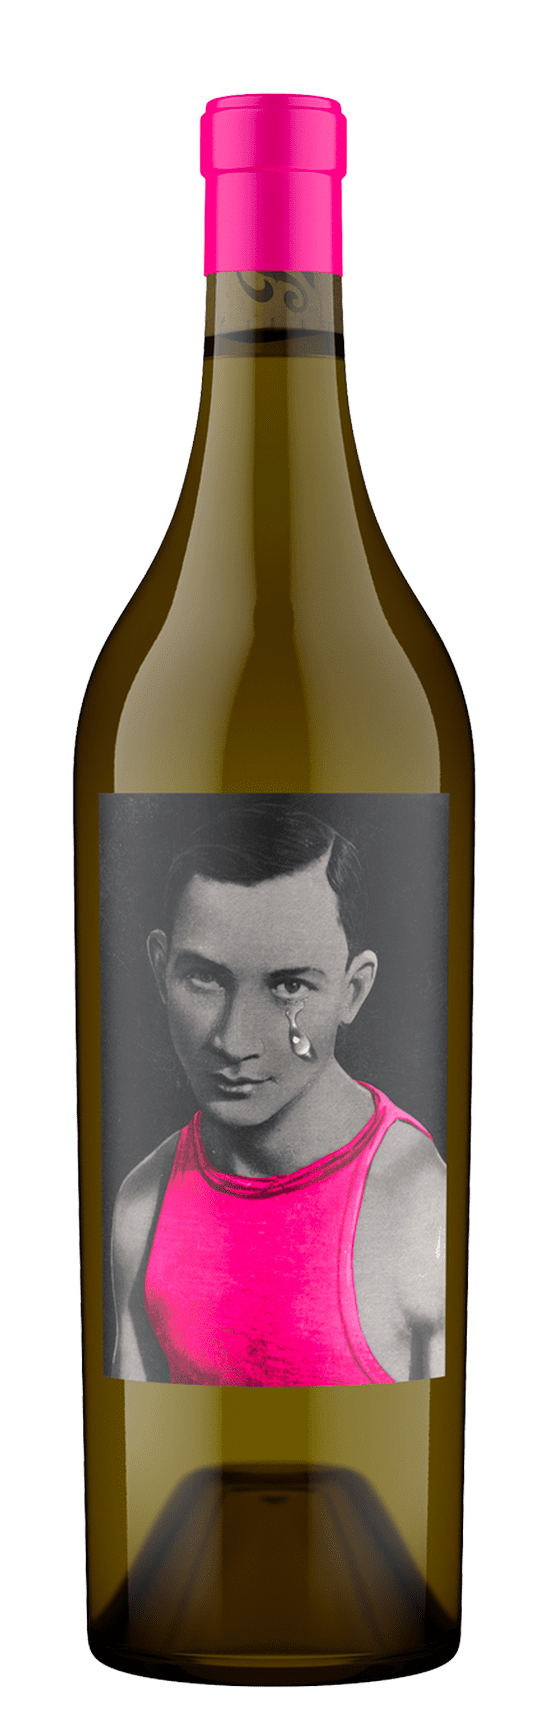 2020 Boys Cry, Carbonic White Wine, El Dorado County